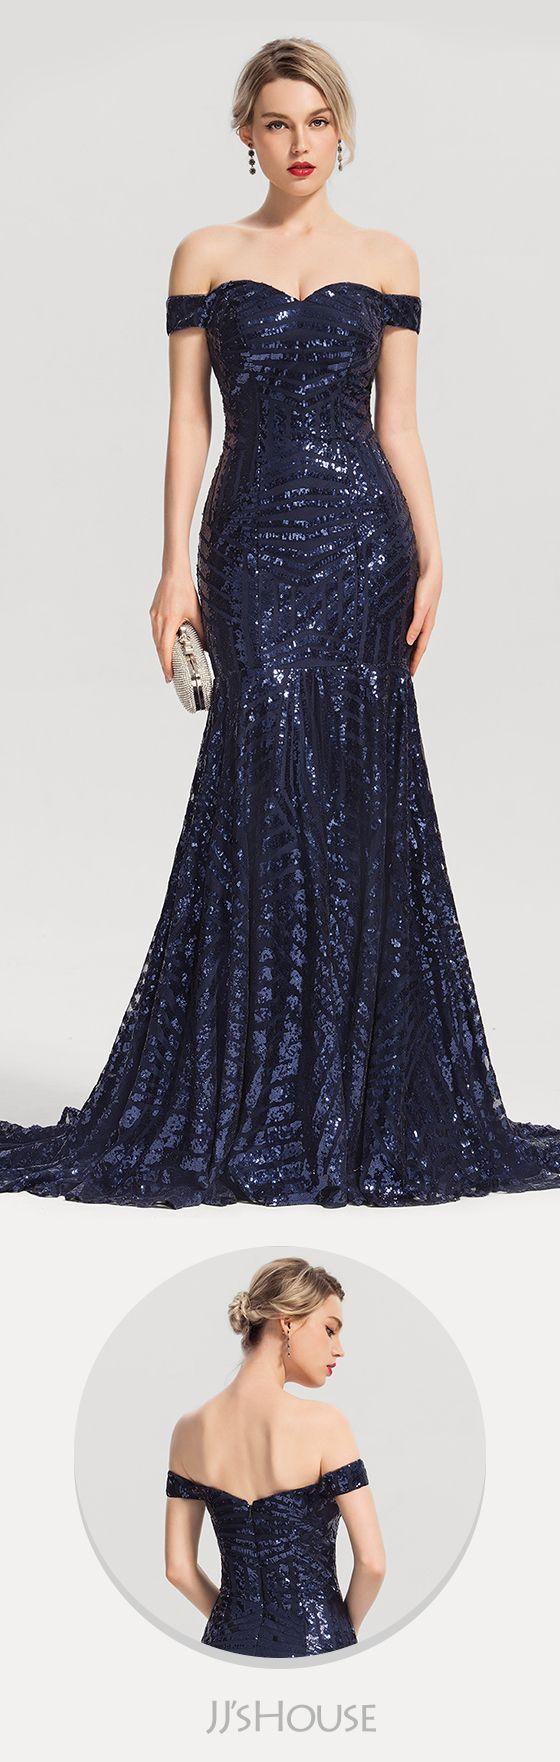 07393b36 Trumpet/Mermaid Off-the-Shoulder Sweep Train Sequined Evening Dress # JJsHouse #Evening dresses